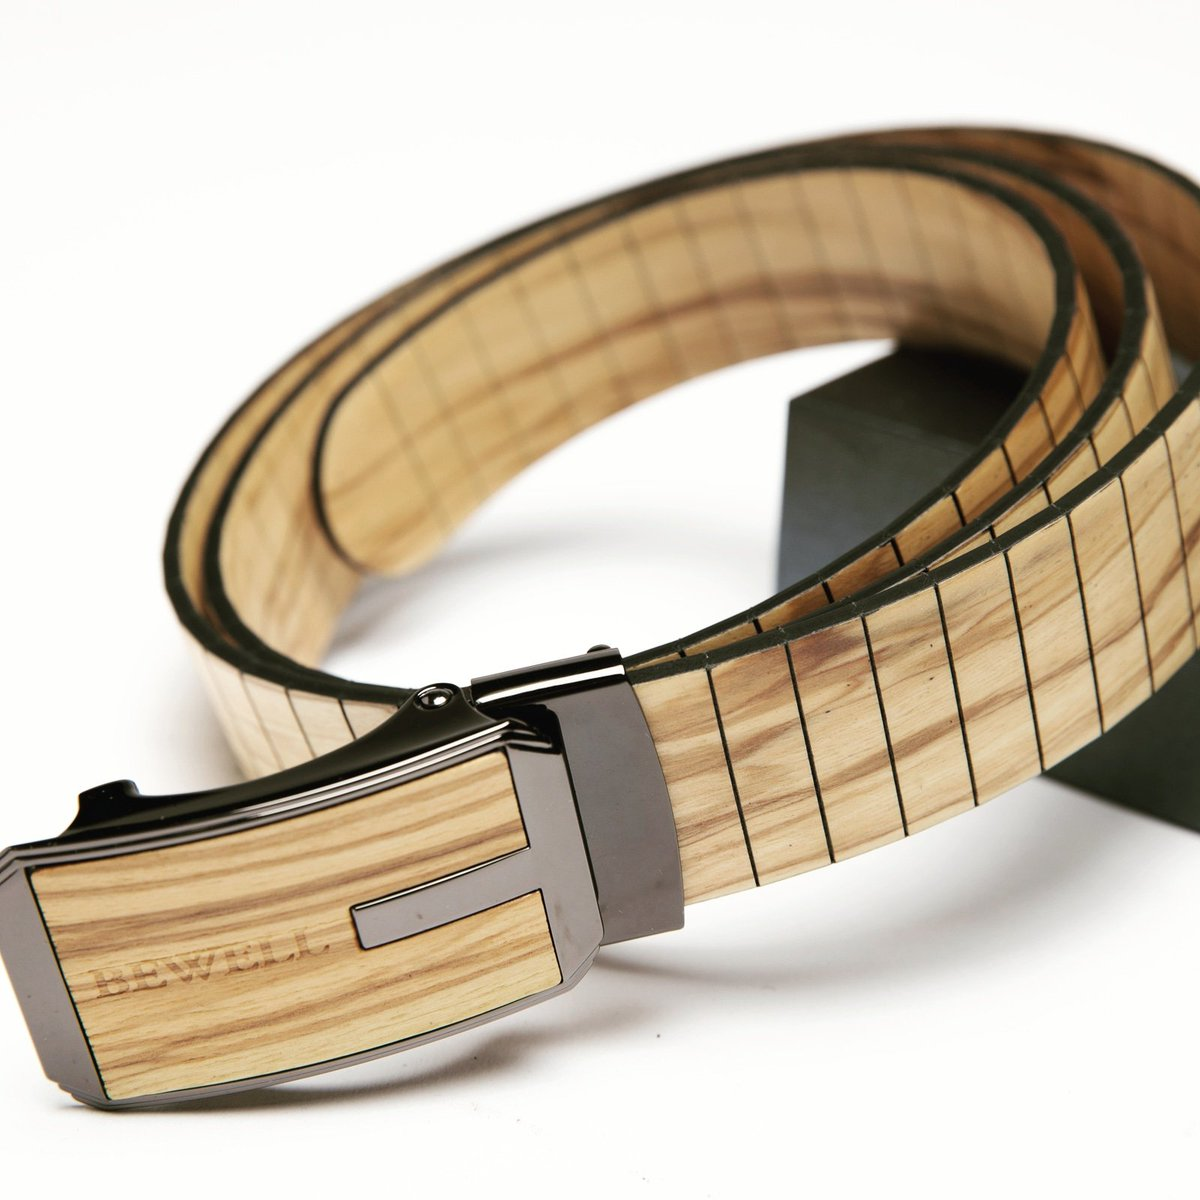 A belt completes the look  #igstyle #mensfashion #fallfashion #fallfashion2020 #stylediaries #mensstyle #whatiwore #fashion #jewelryaddict #menstyle #watchgeek #waistgame #timepiece #dapper #watchesofinstagram #beltbuckles #beltbuckles #beltsforsale #beltedpants #beltsofinstagram https://t.co/7aYlmqy2bl